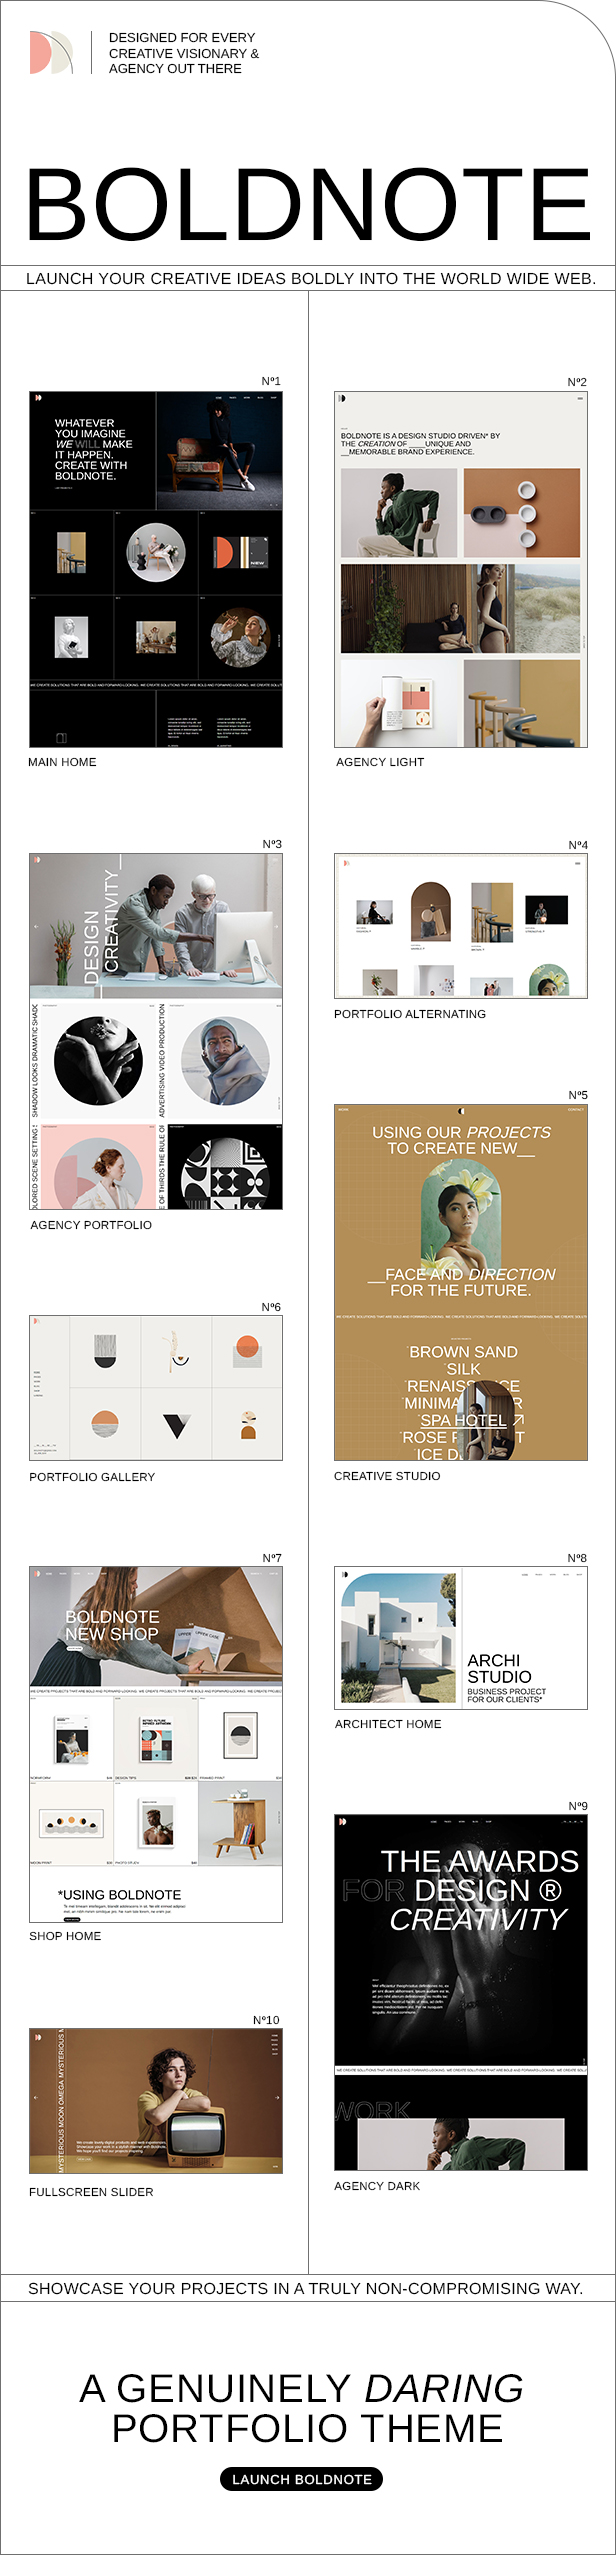 Boldnote - Portfolio and Agency Theme - 3